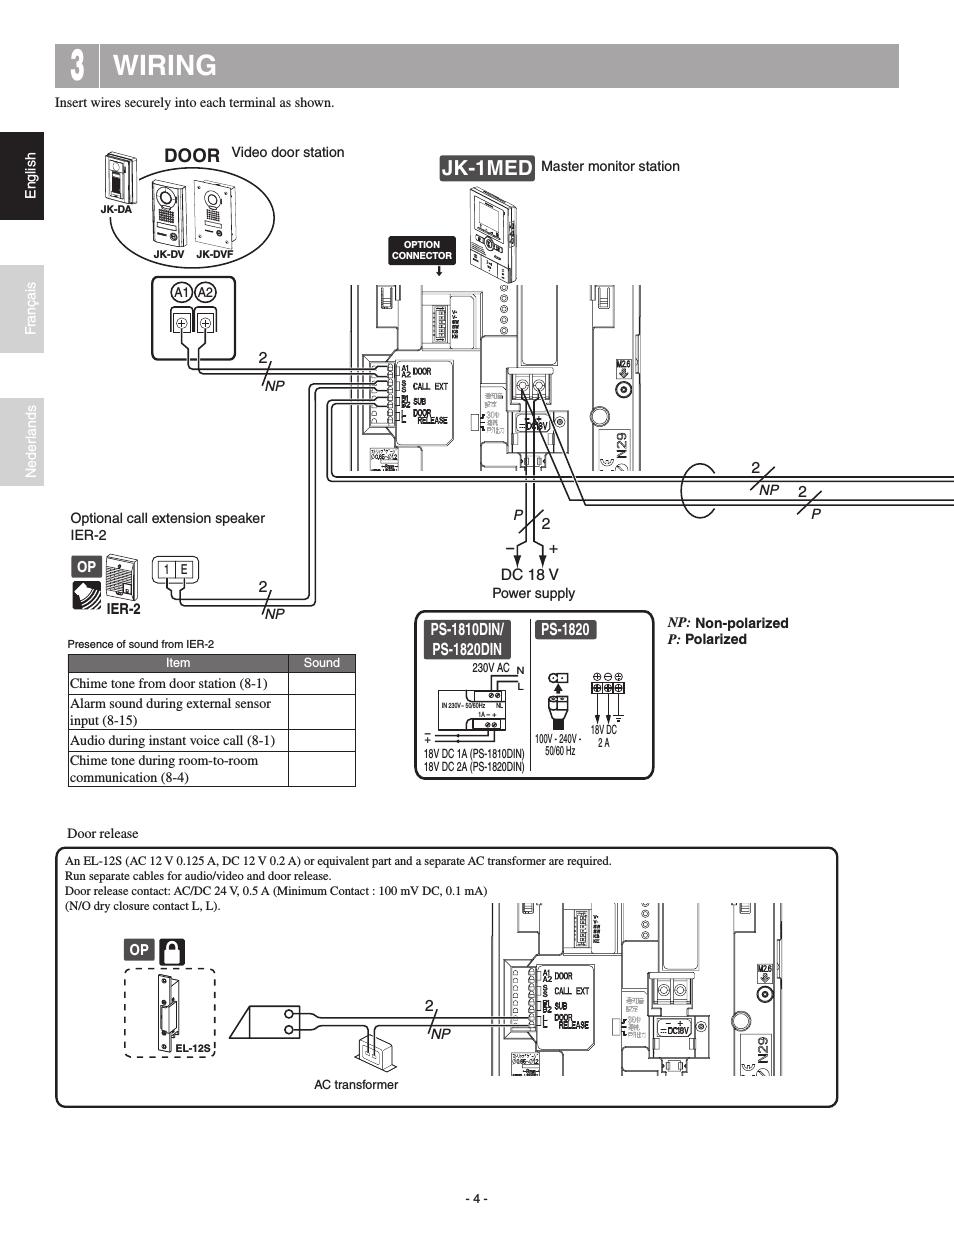 Aiphone Ix Mv Wiring Diagram / Mg 7980 Wiring Diagram